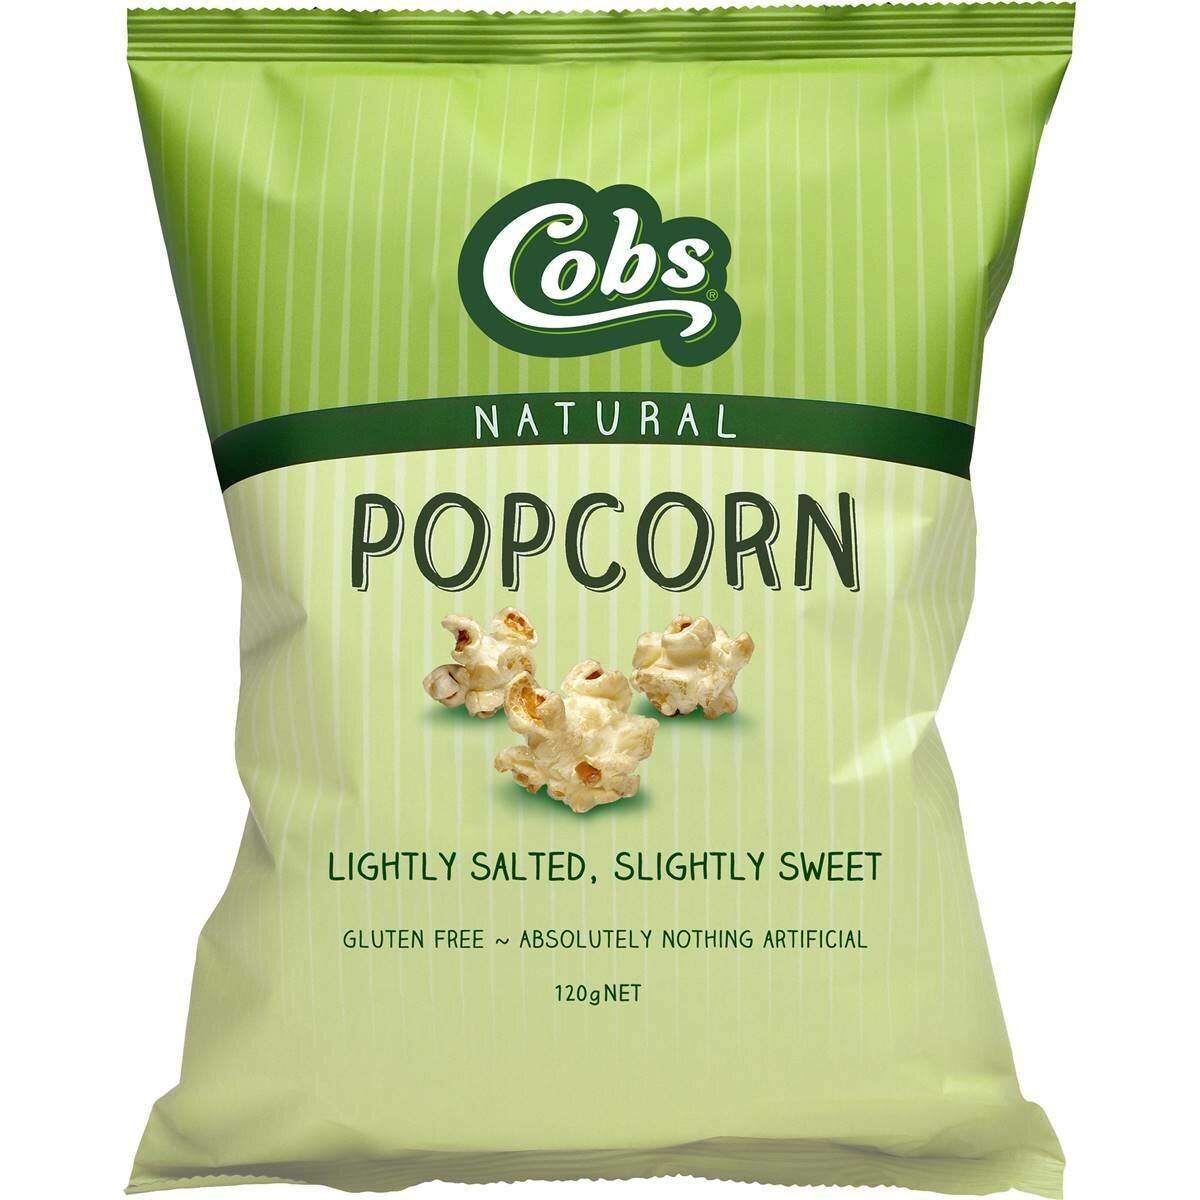 Cobs Popcorn Lightly Salted 120g